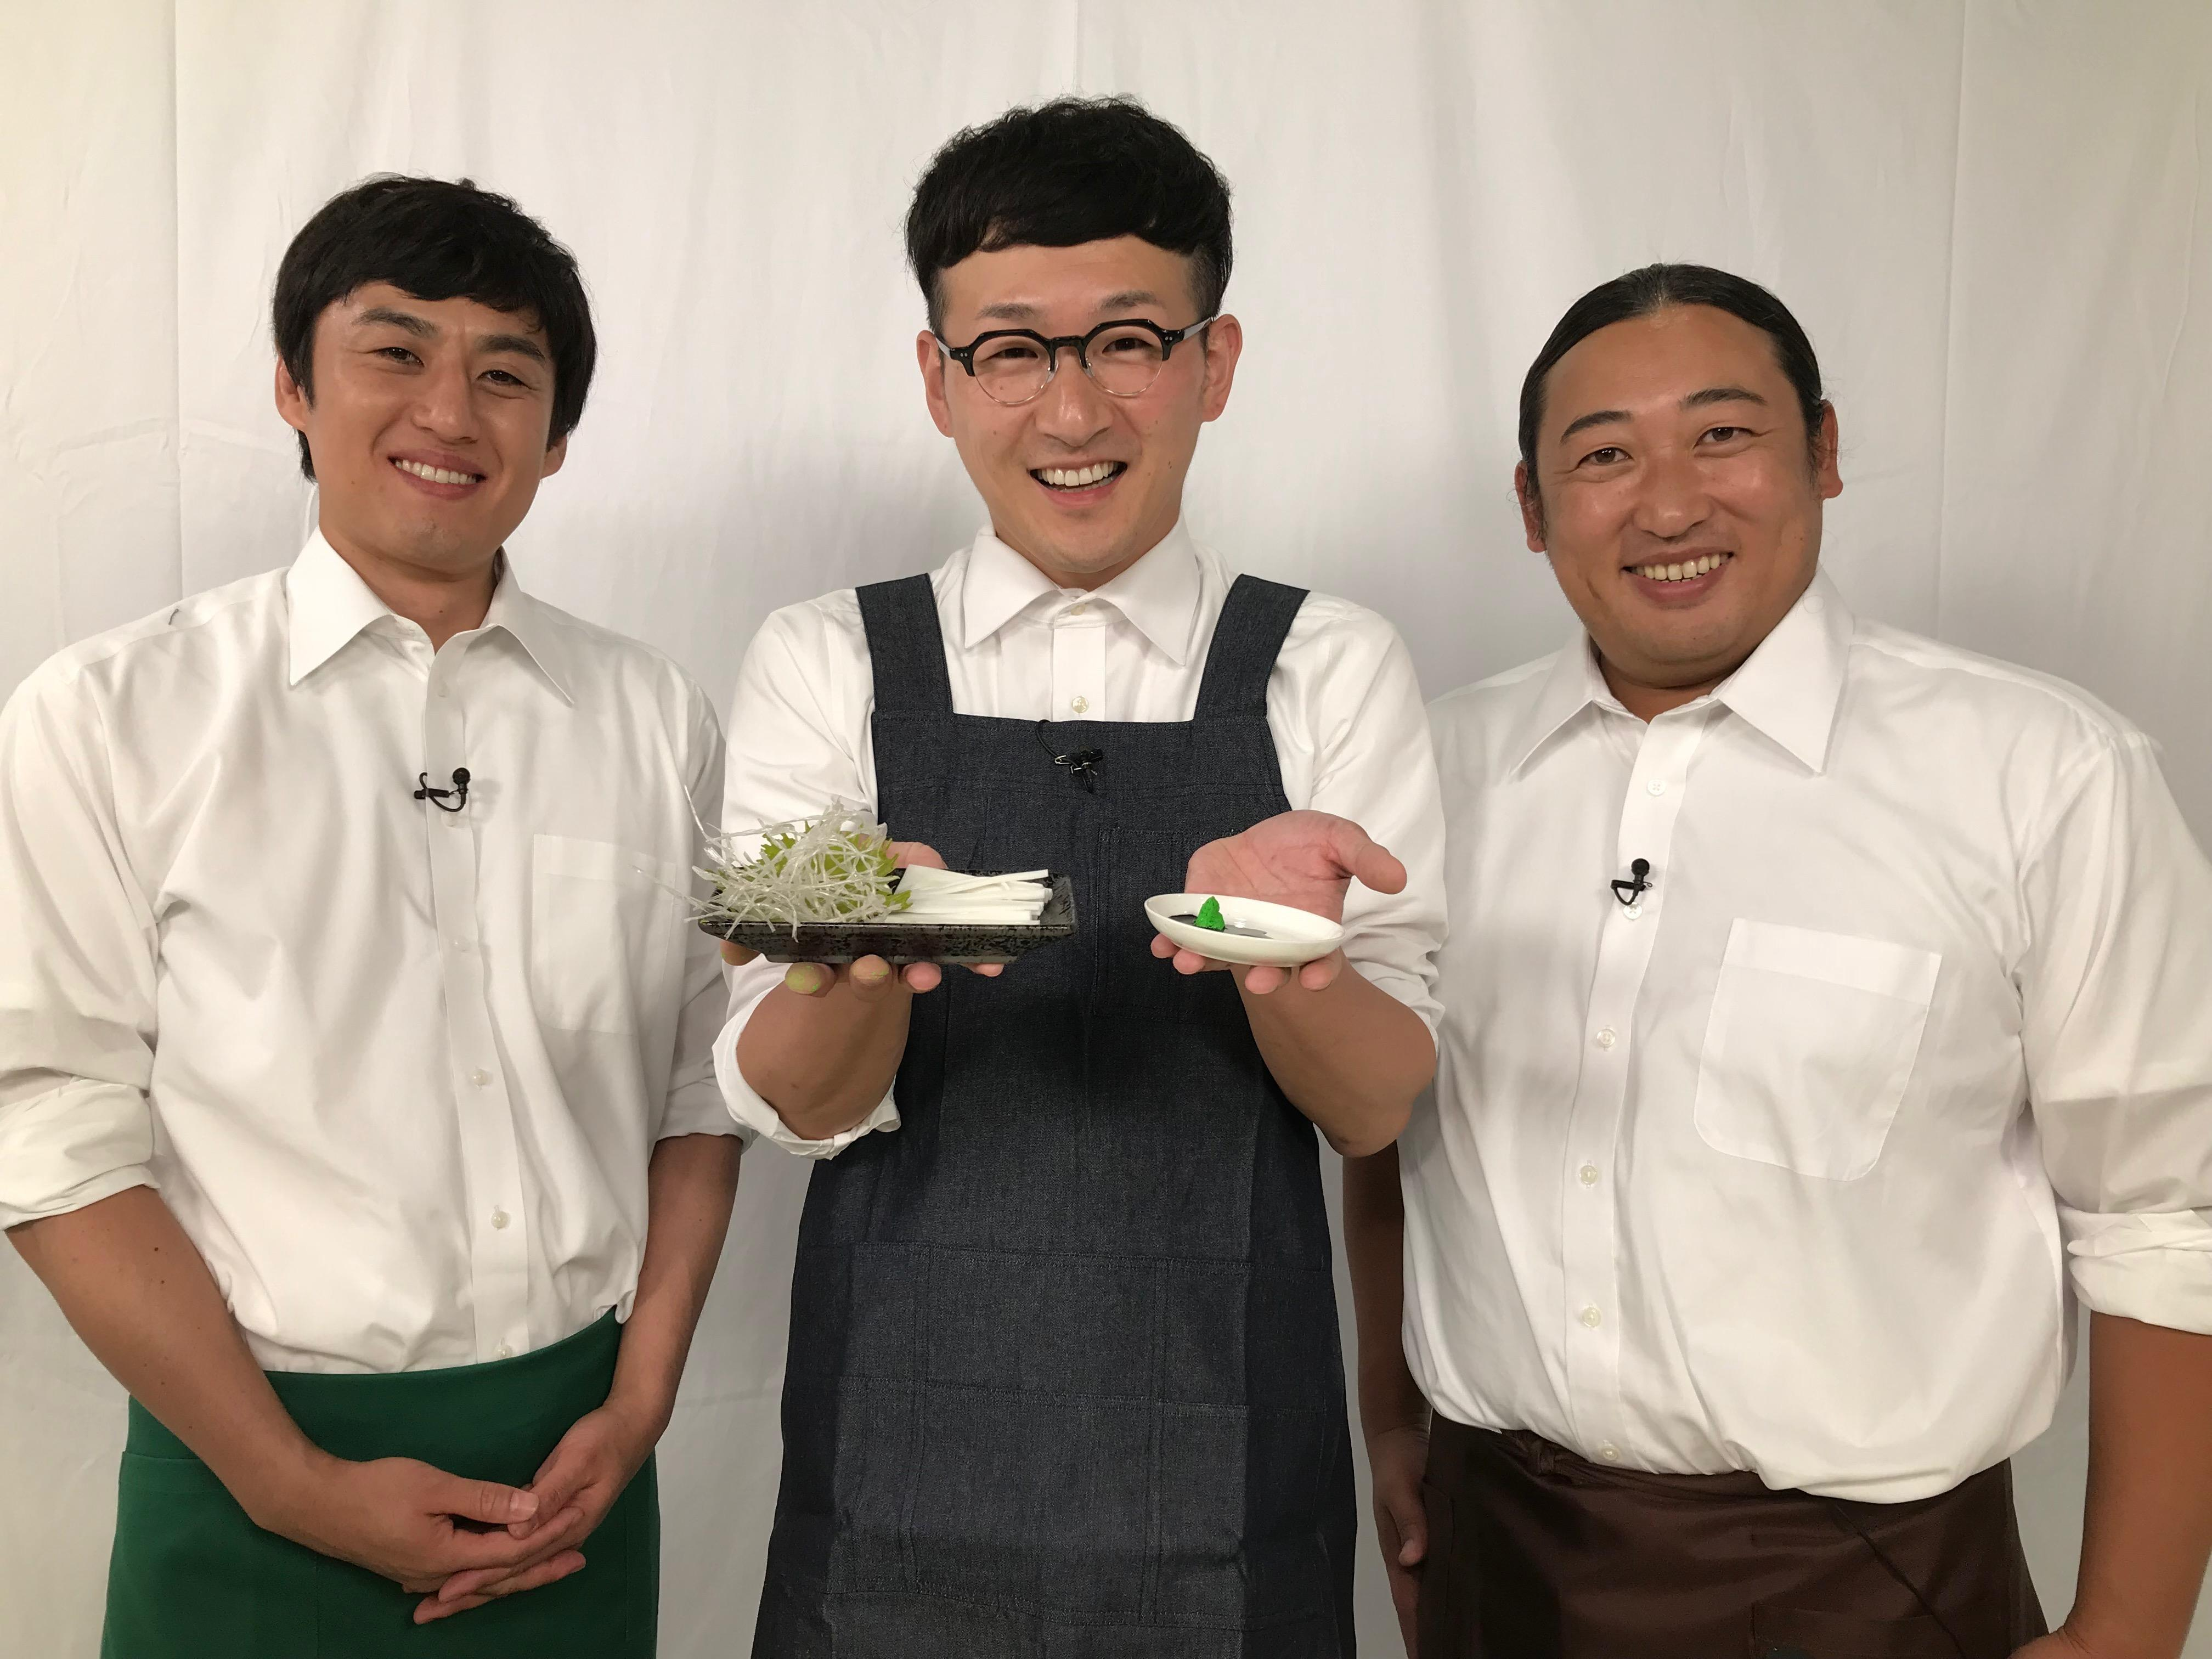 http://news.yoshimoto.co.jp/20180711112258-285d7b60932671f70be3b3072b2c535720e82c88.jpg